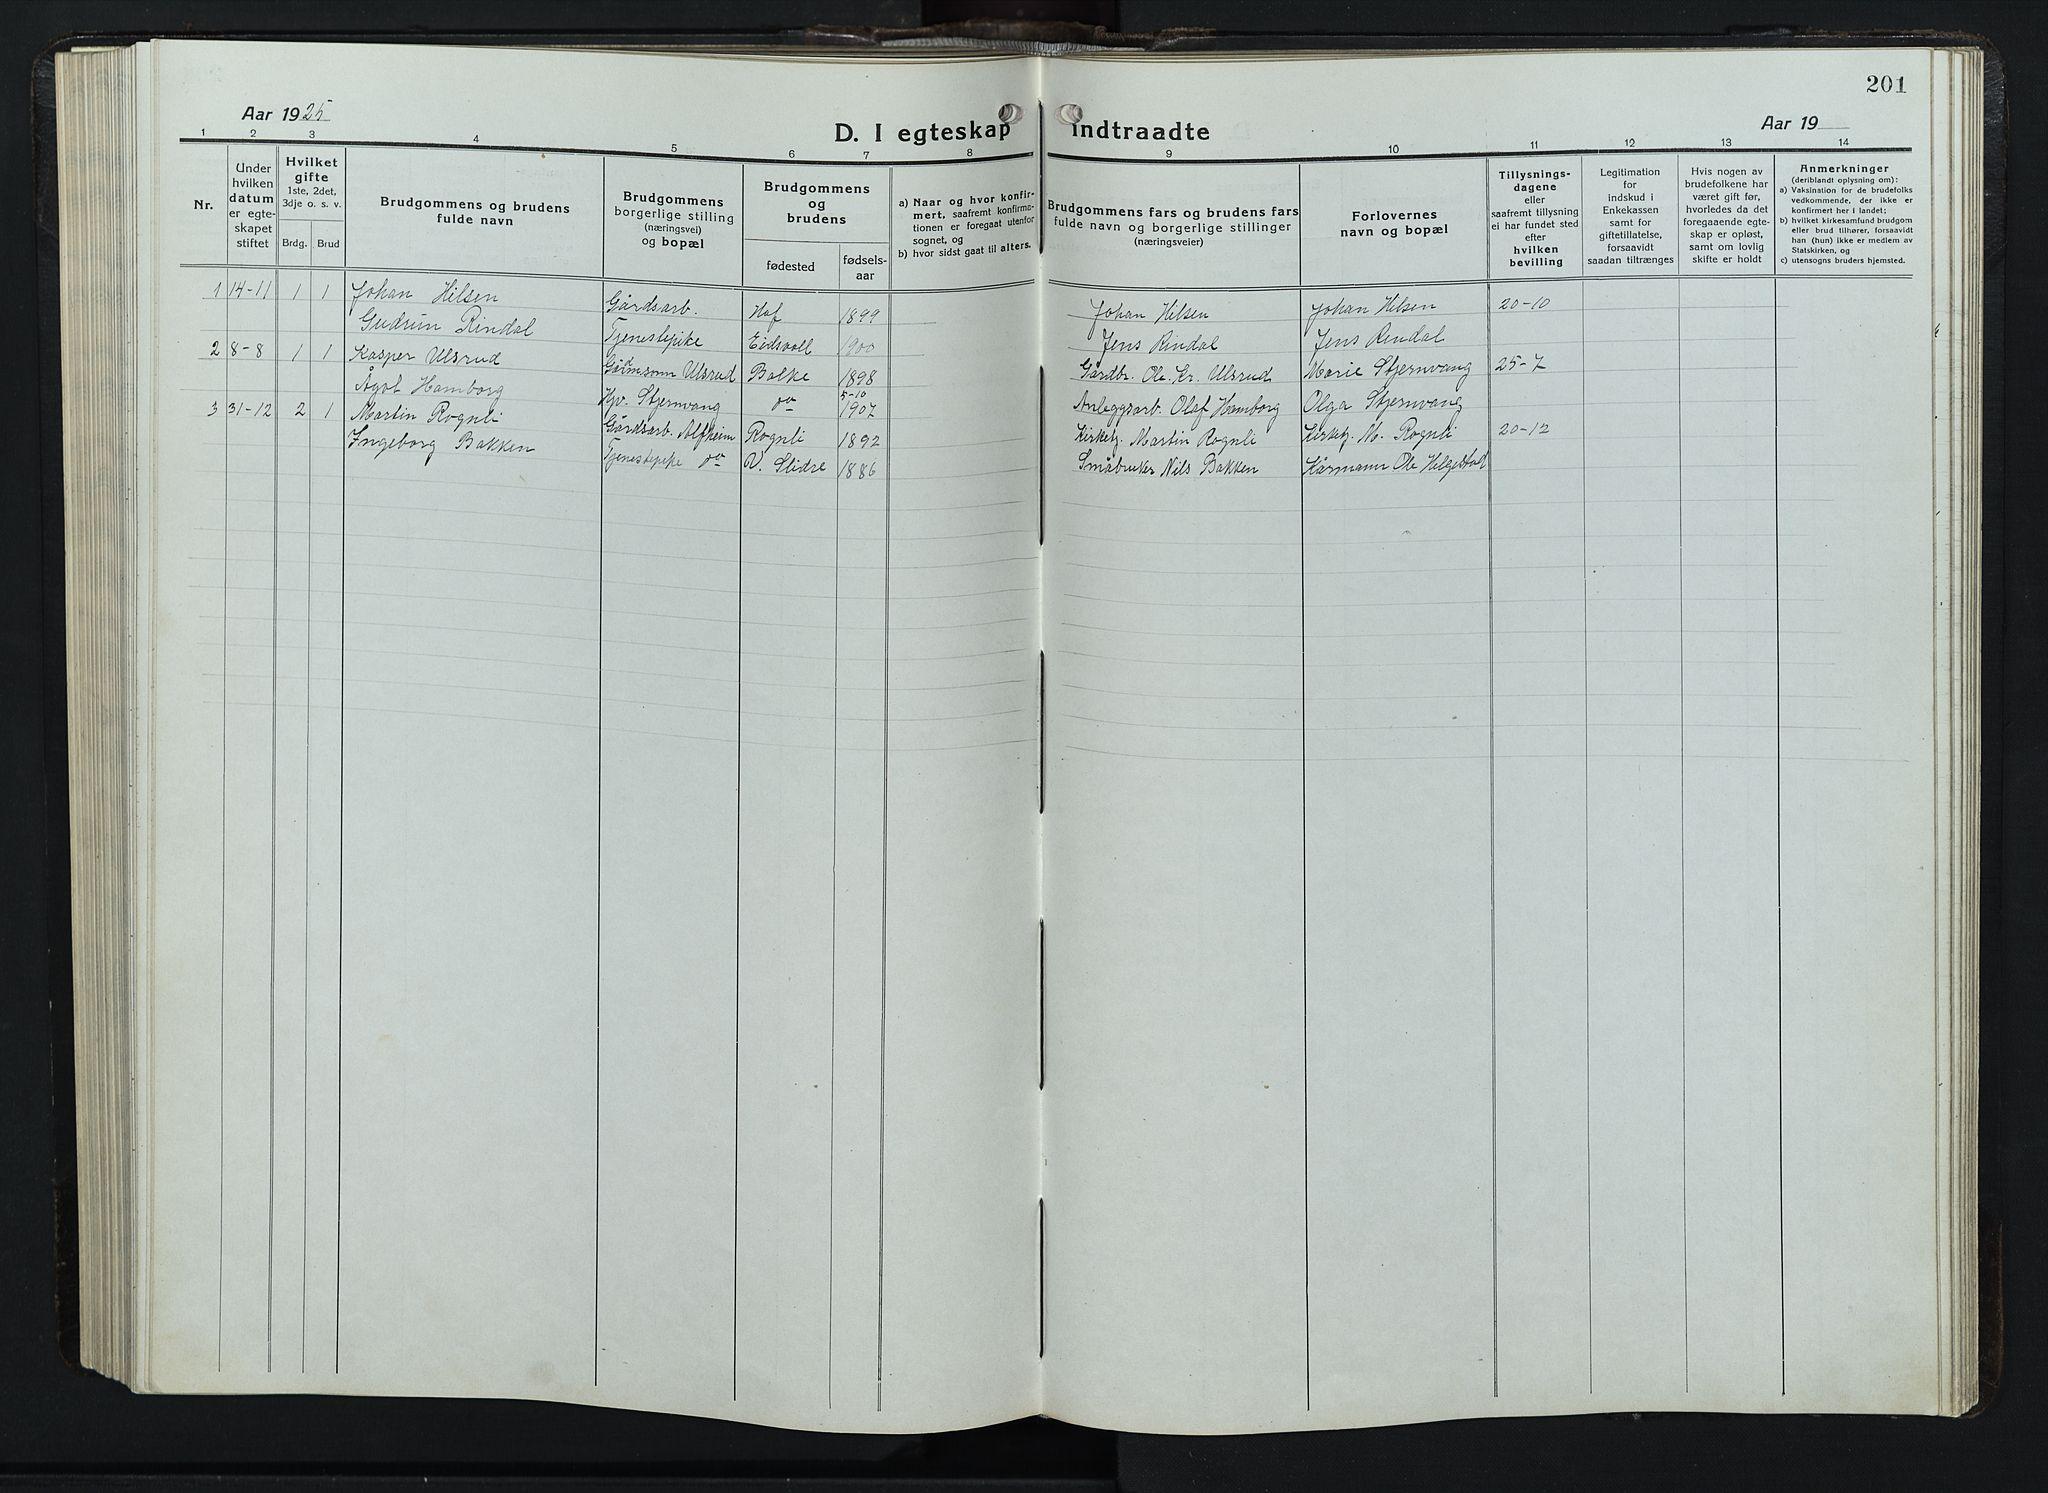 SAH, Balke prestekontor, Klokkerbok nr. 1, 1920-1955, s. 201